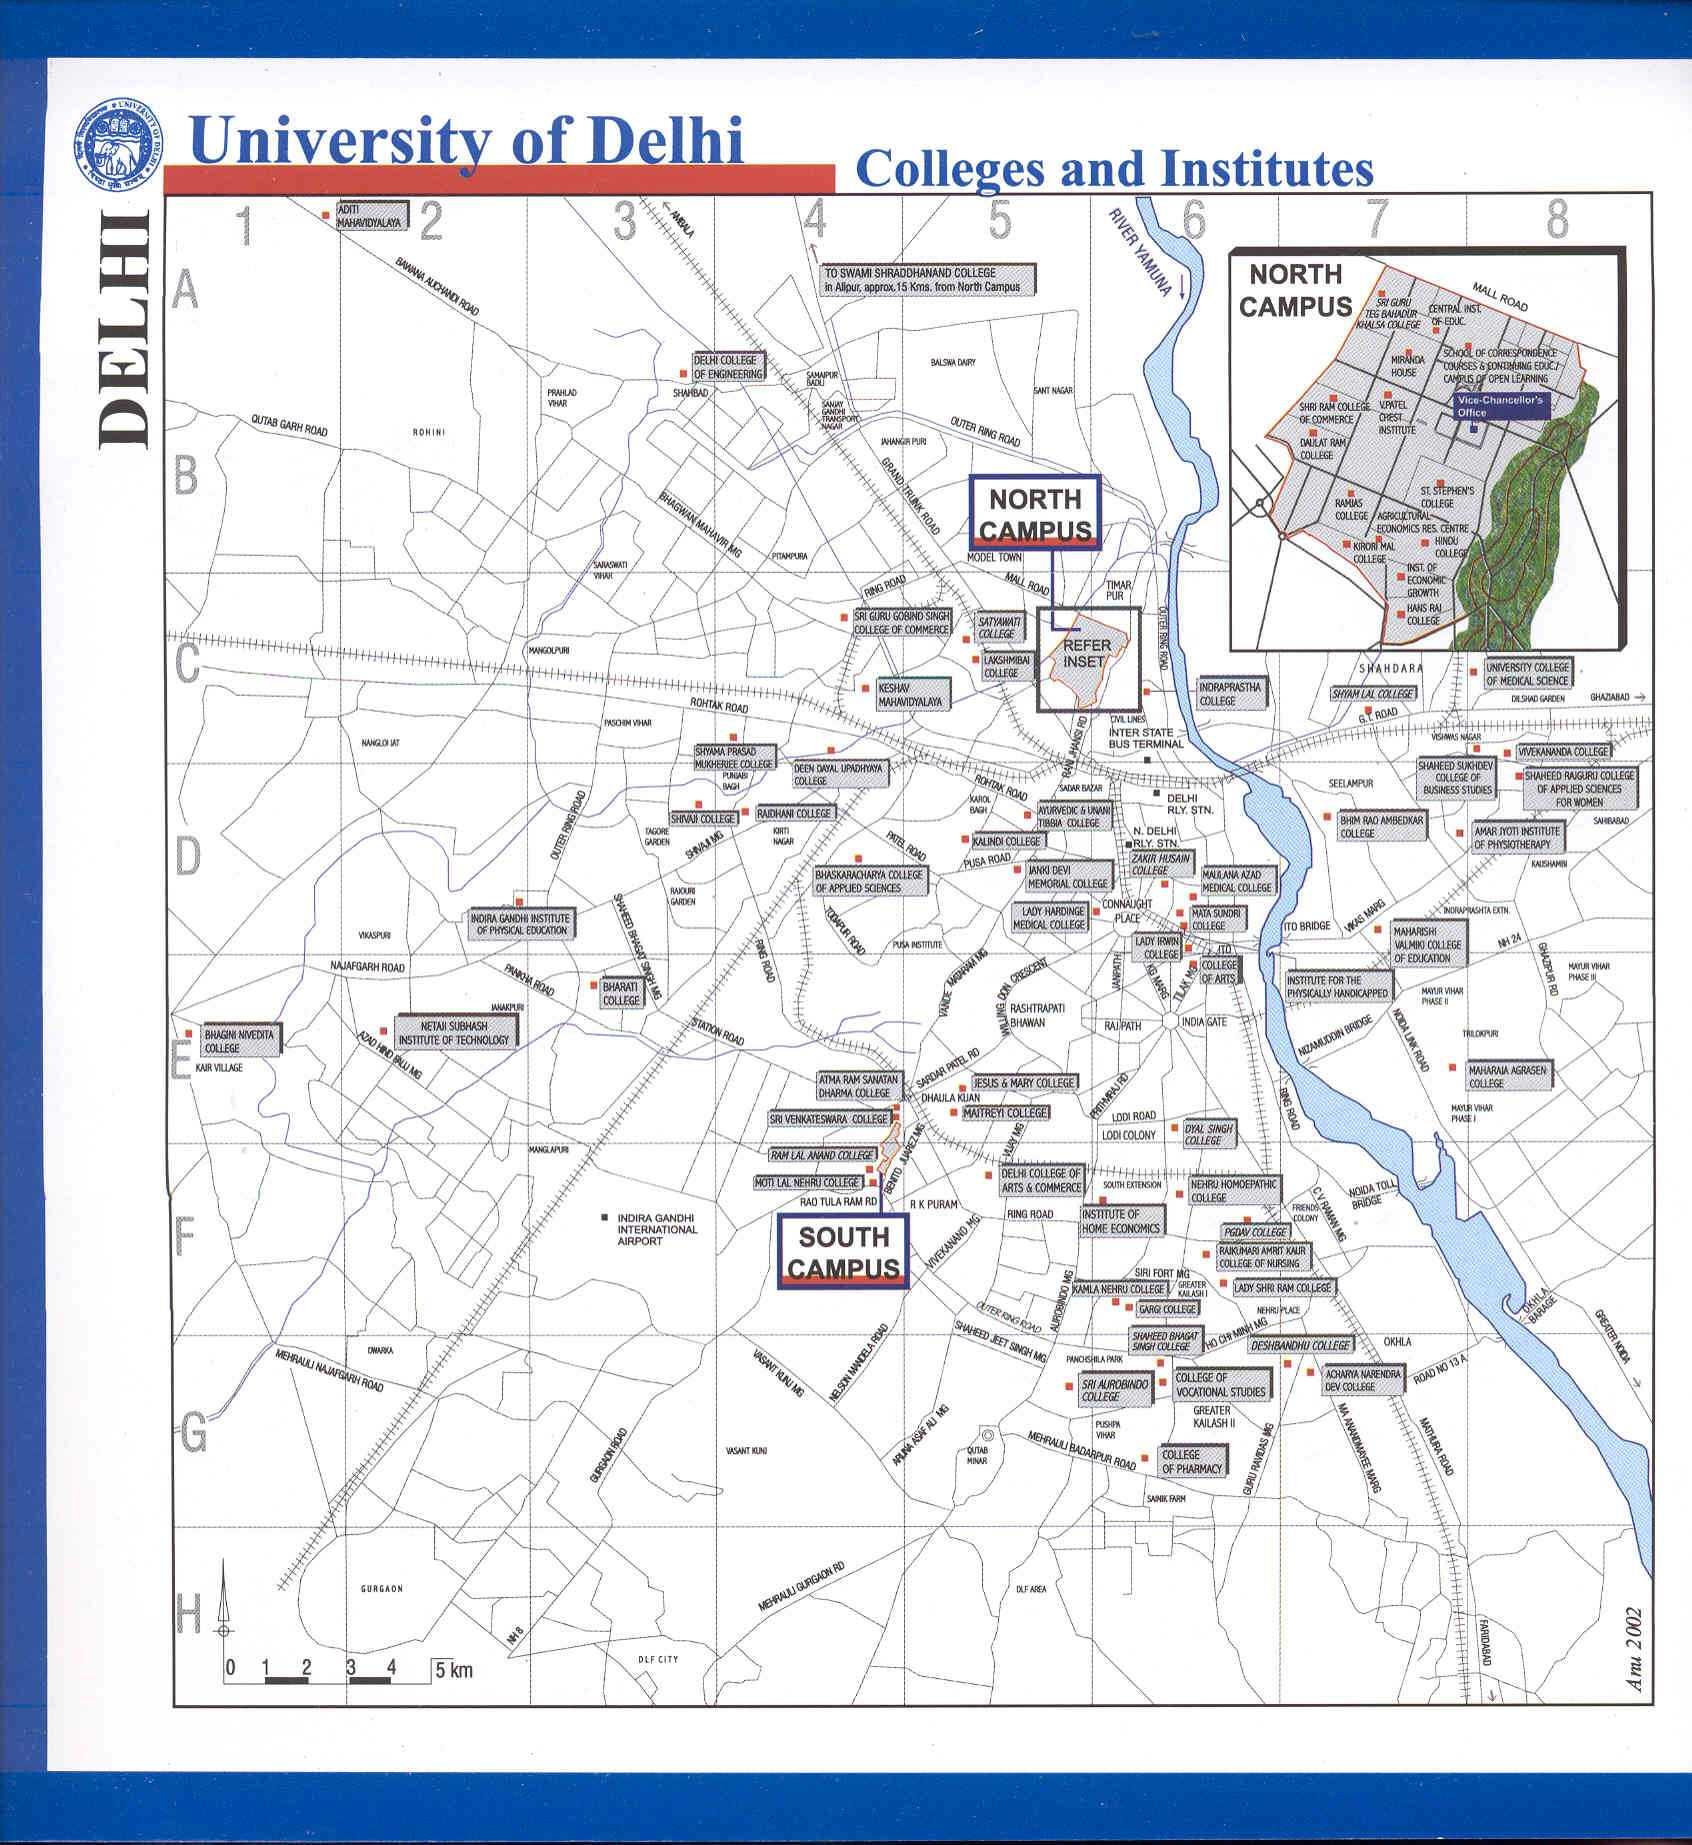 Delhi University college locations map